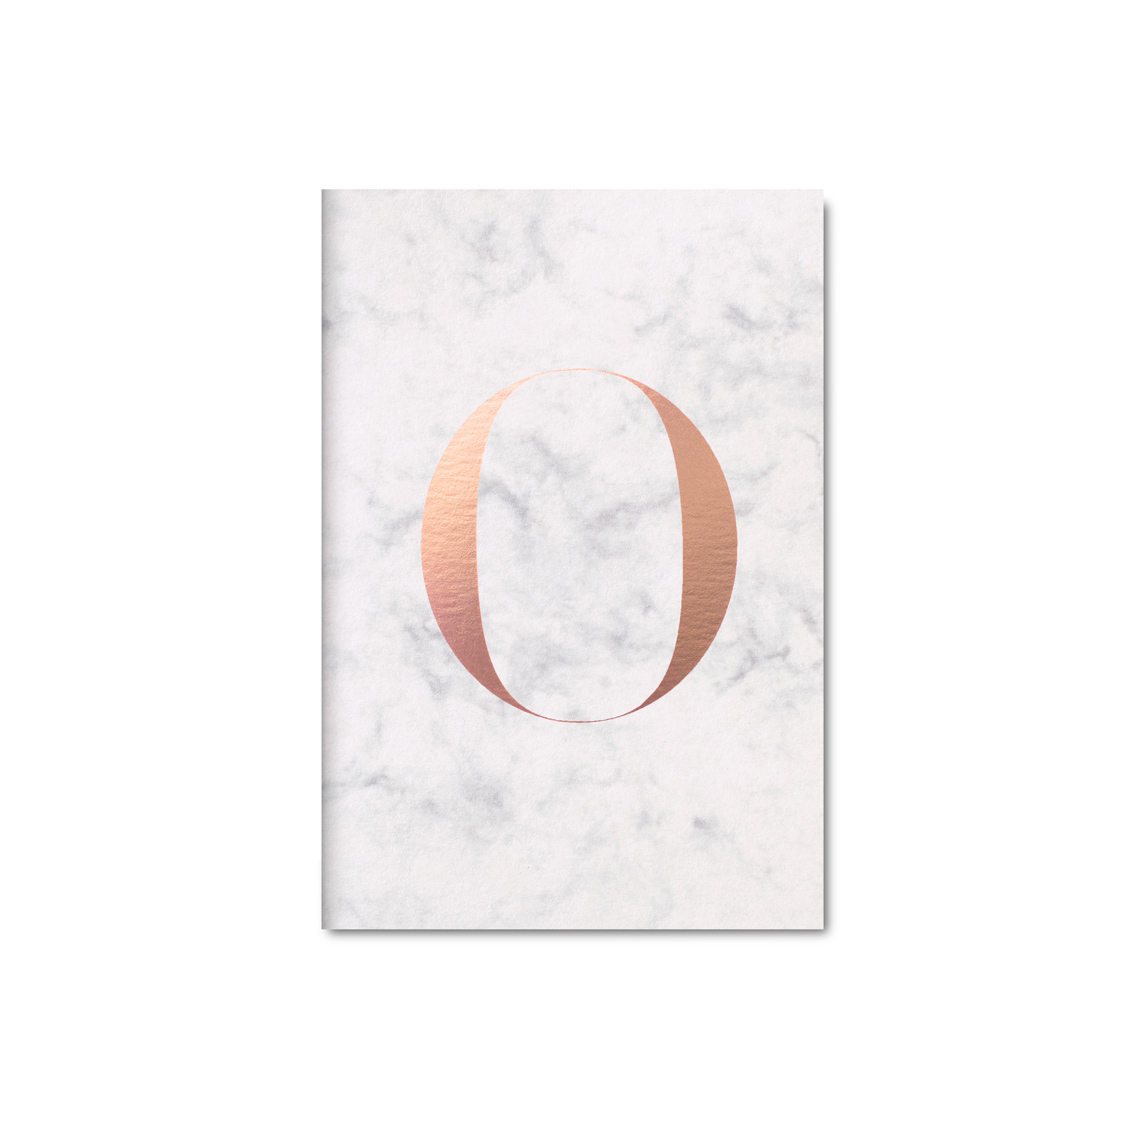 Marble Pocket by StudioSarah